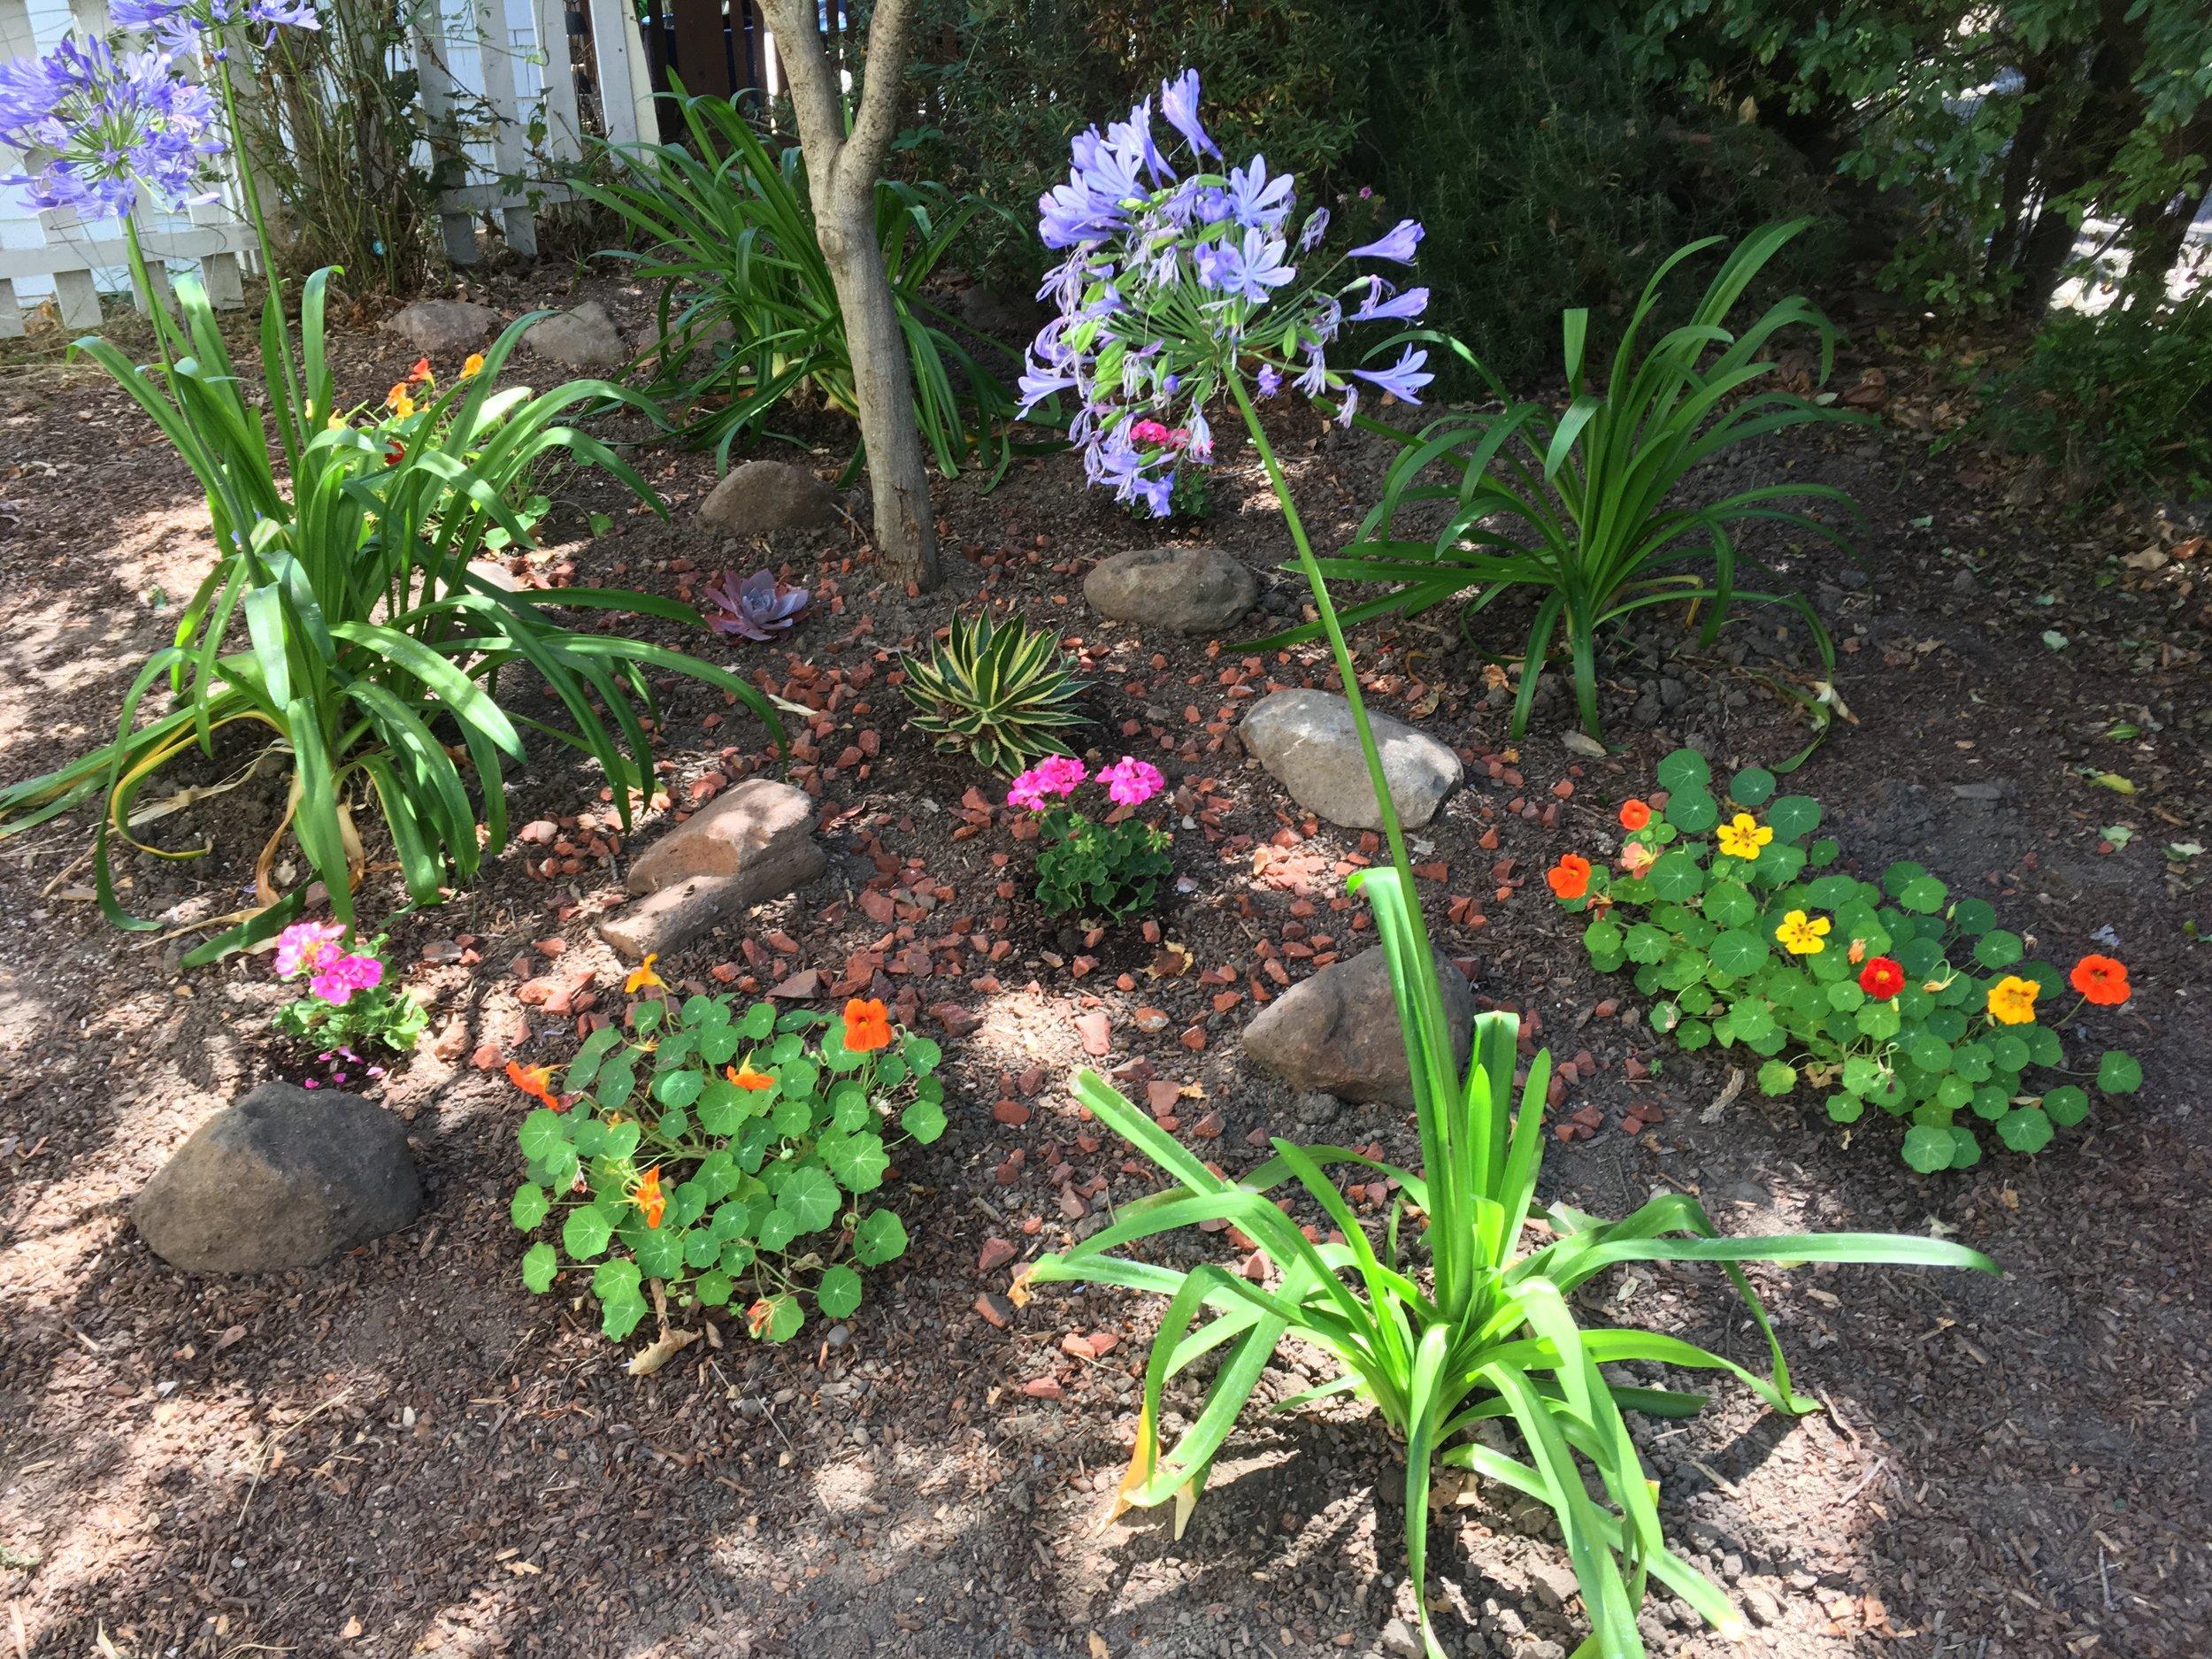 agapantha, nasturtium, and geranium with succulent, agave, and brick chips